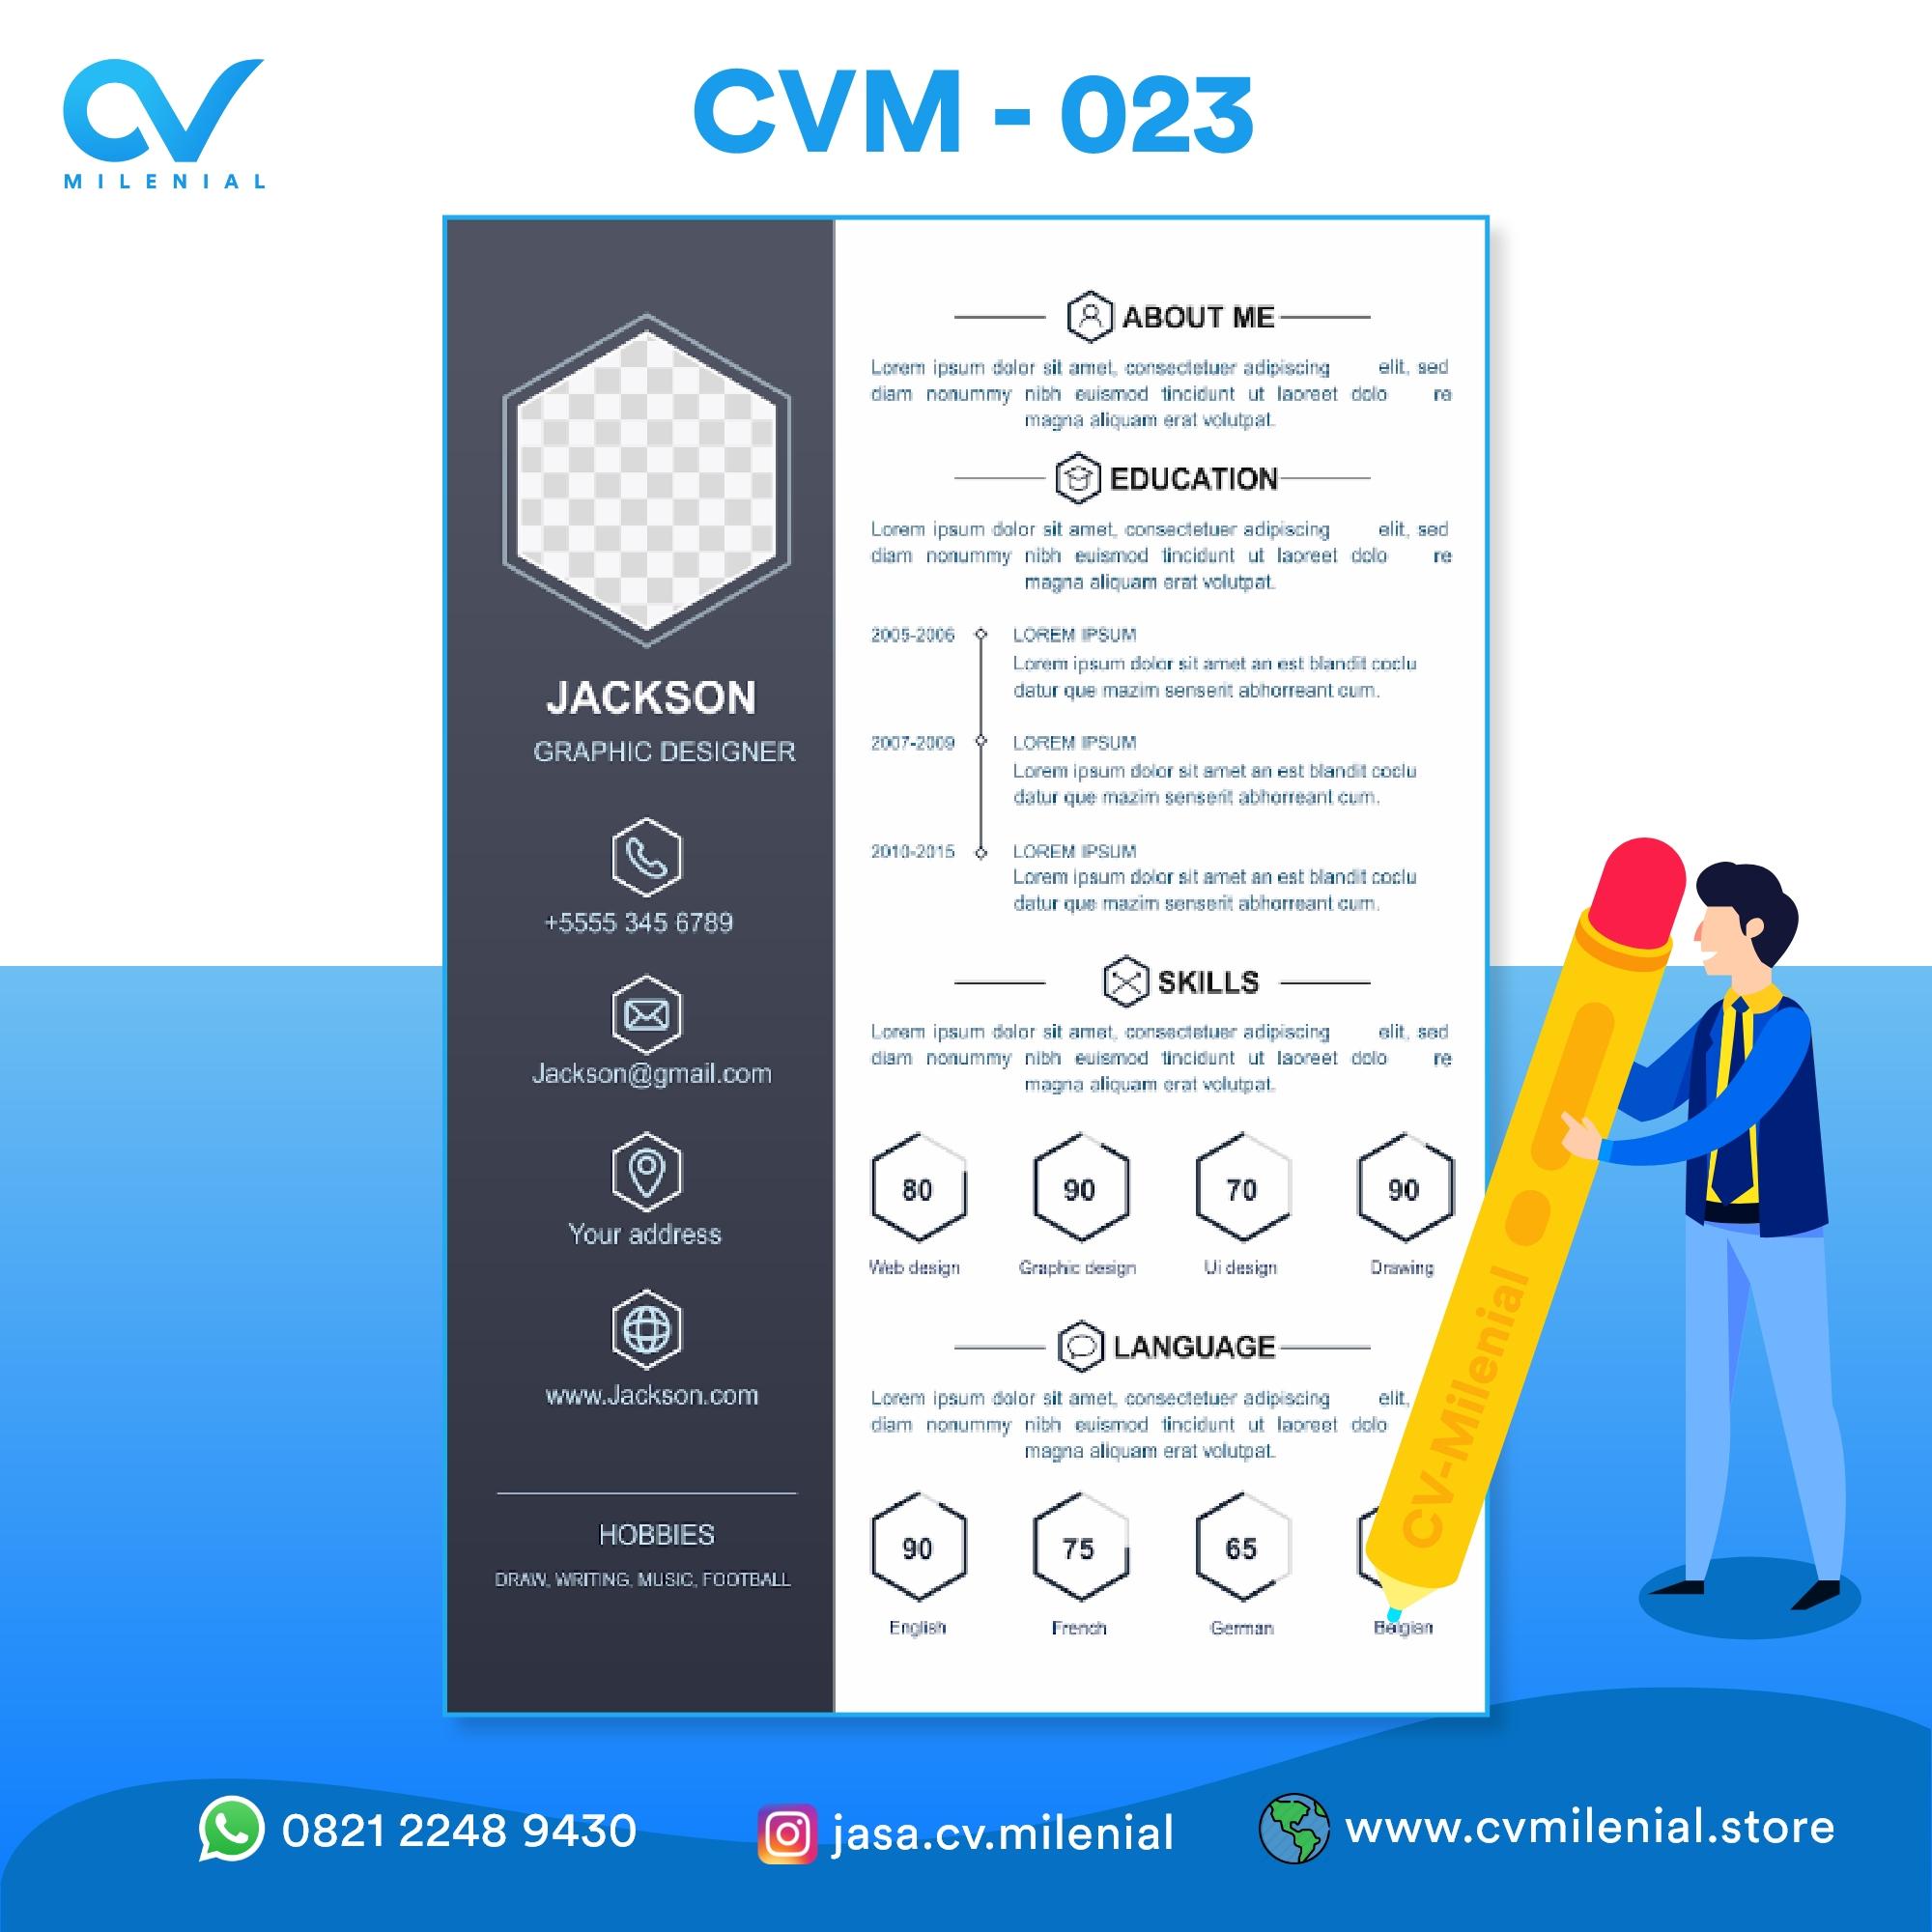 https://cvmilenial.com/assets/image/desain_cv/23.jpg